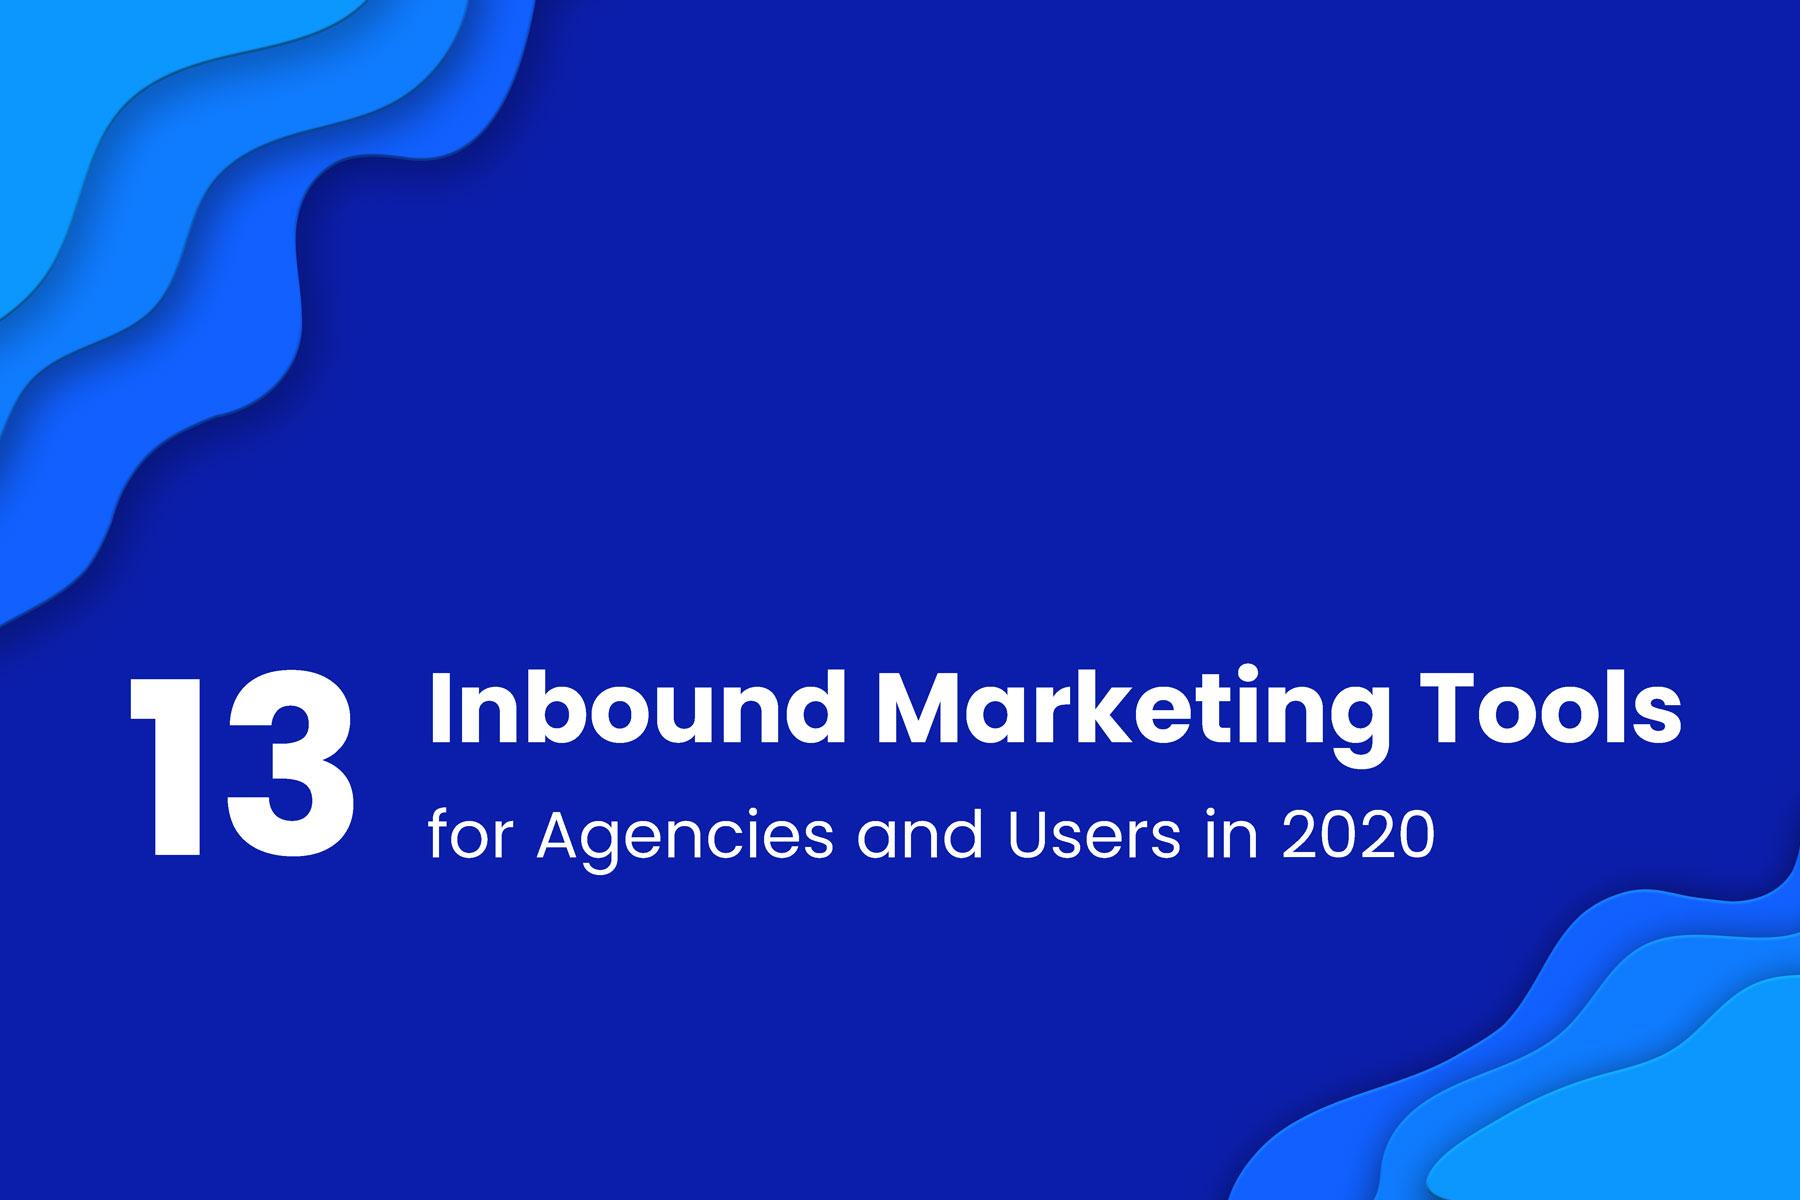 13 Best Inbound Marketing Tools for Agencies